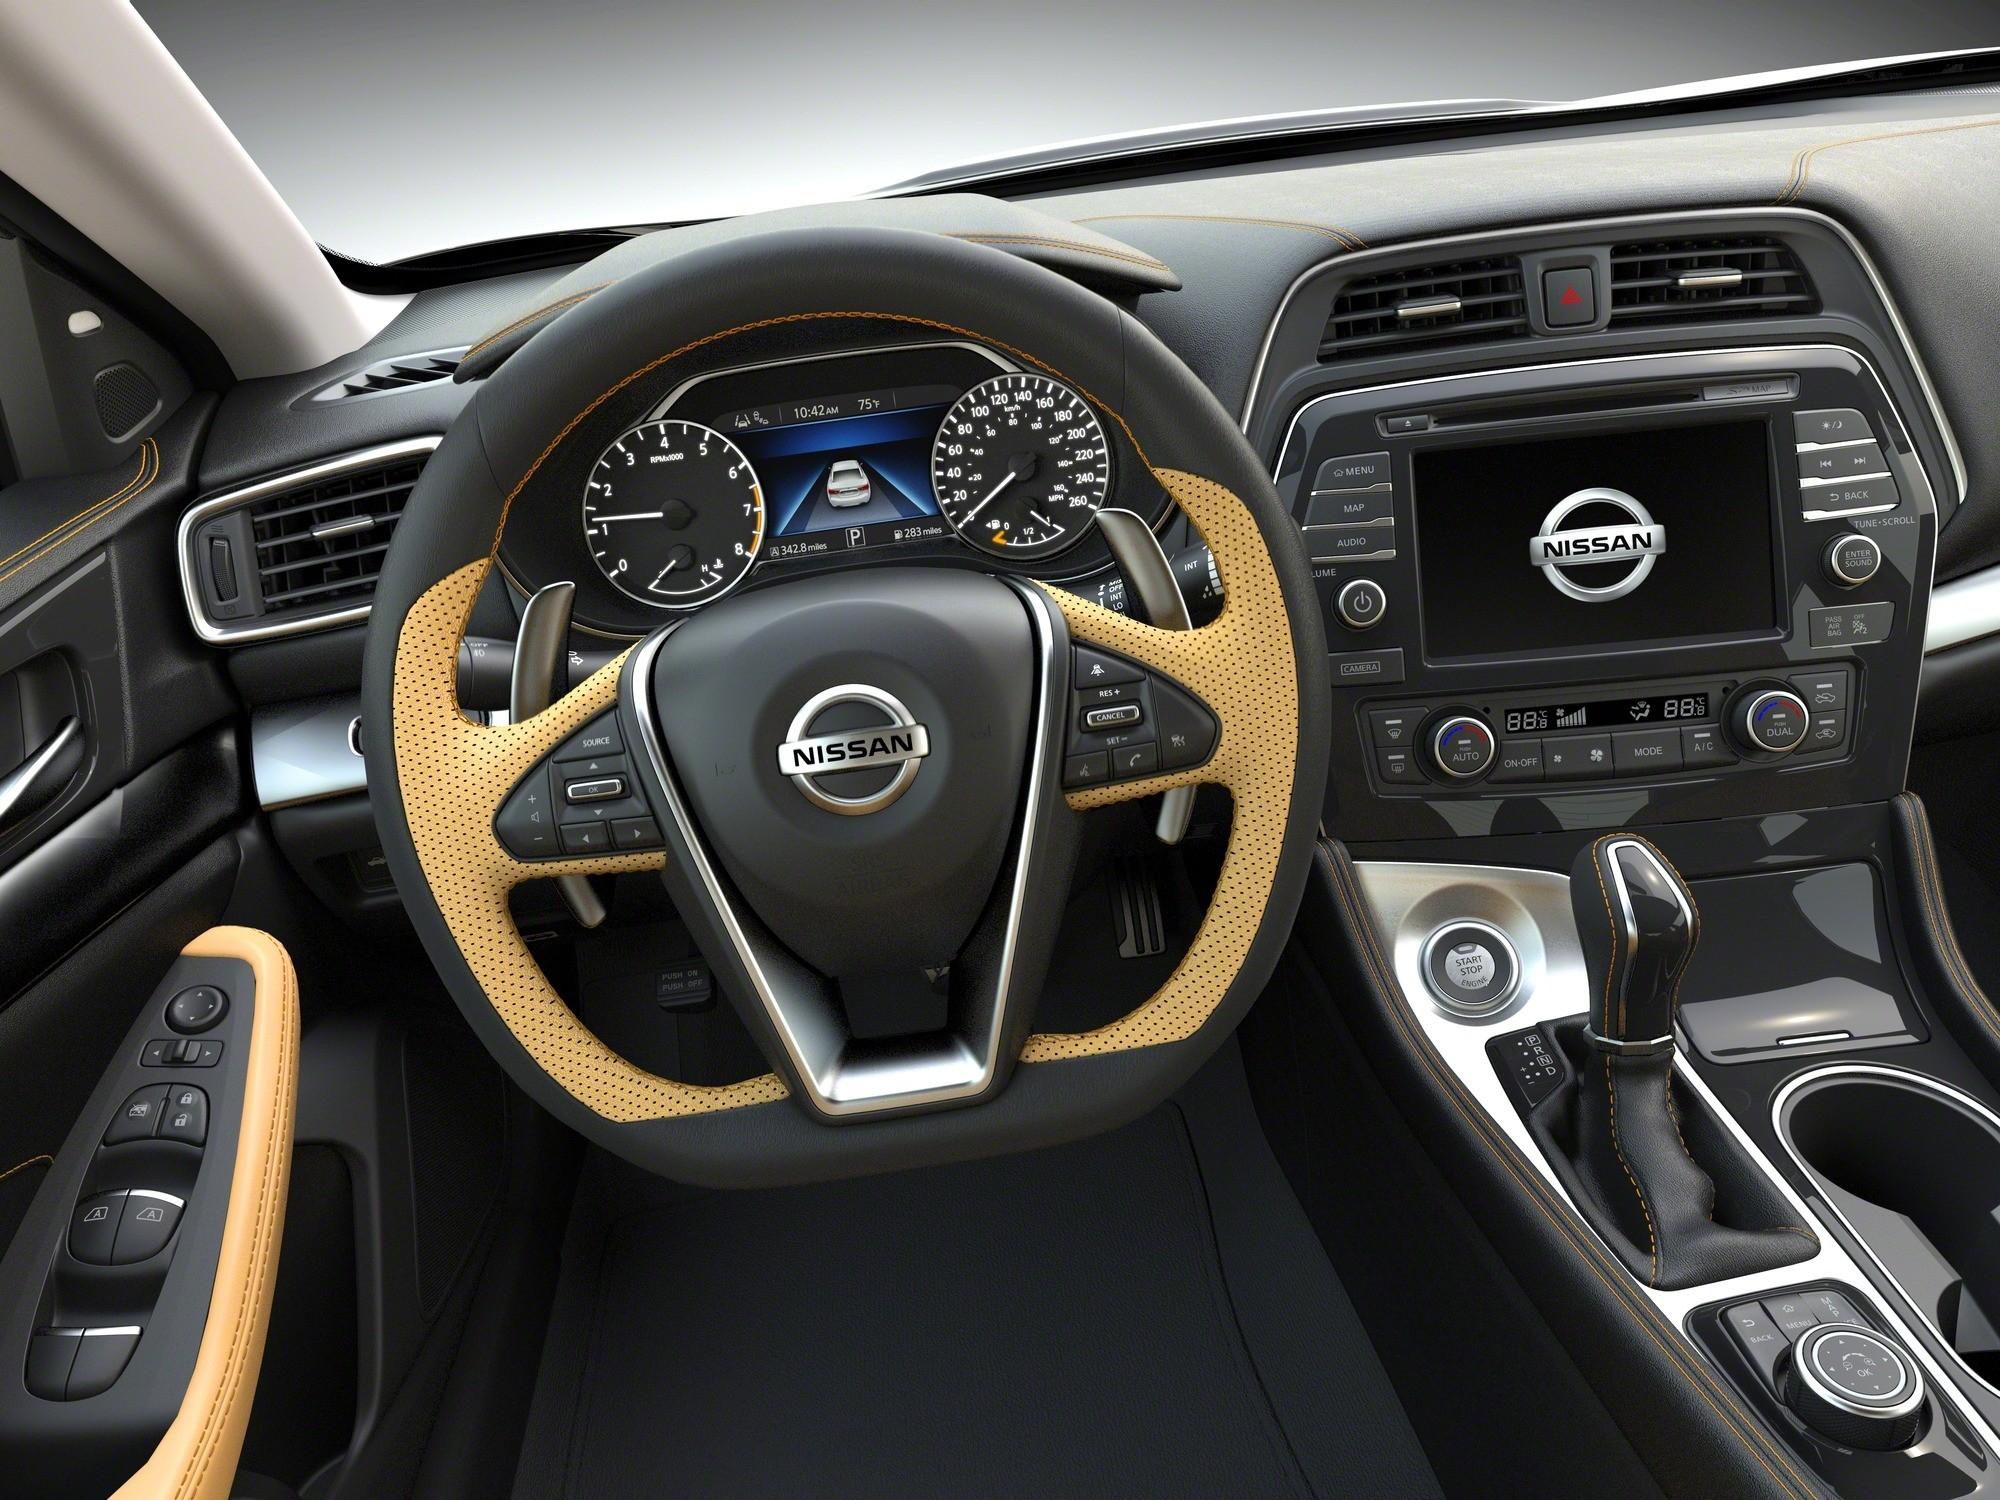 vehicle l ximg sedan award with nissan iihs door smart luxury cars usa m vehicles maxima autopacific price car satisfaction logo sports